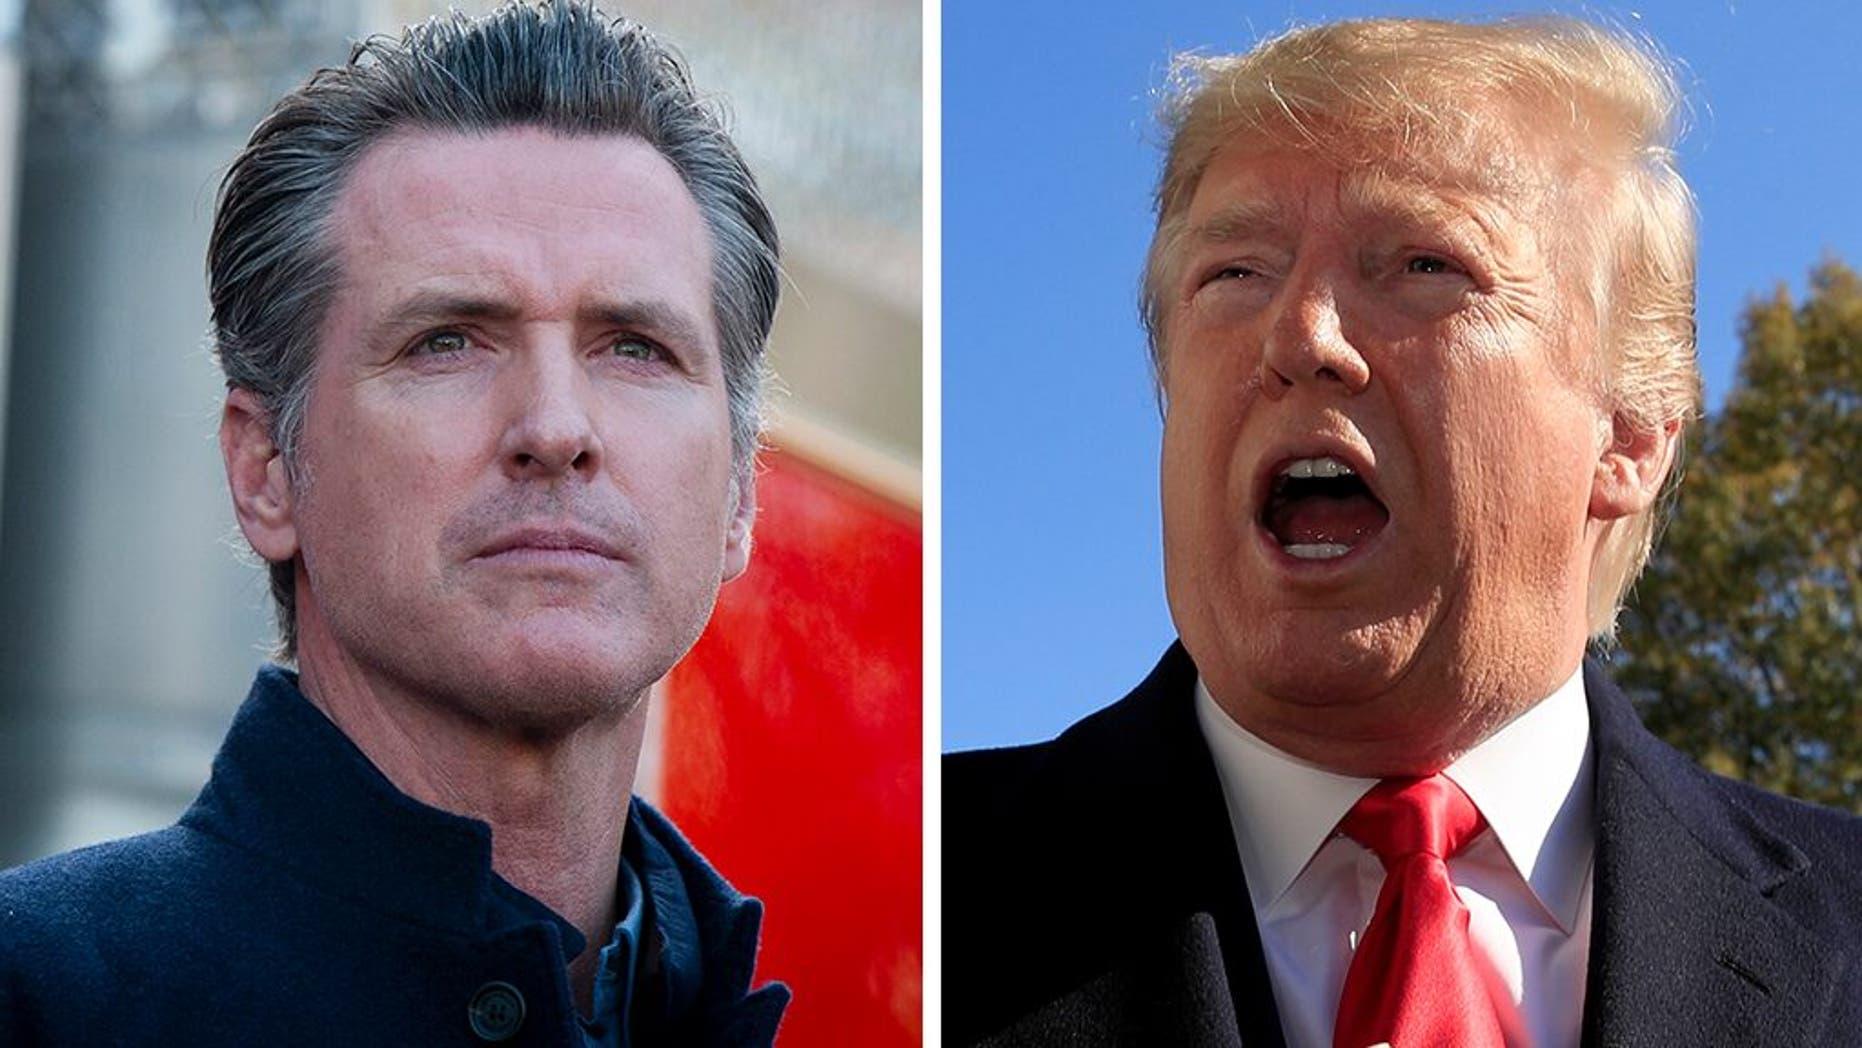 Westlake Legal Group 0dfb02fd-Trump-Newsome_AP Trump warns California: Fix homeless crisis – or feds will step in fox-news/columns/fox-news-first fox news fnc/us fnc article 84dd37bd-31bd-5be4-a092-c004595e5353